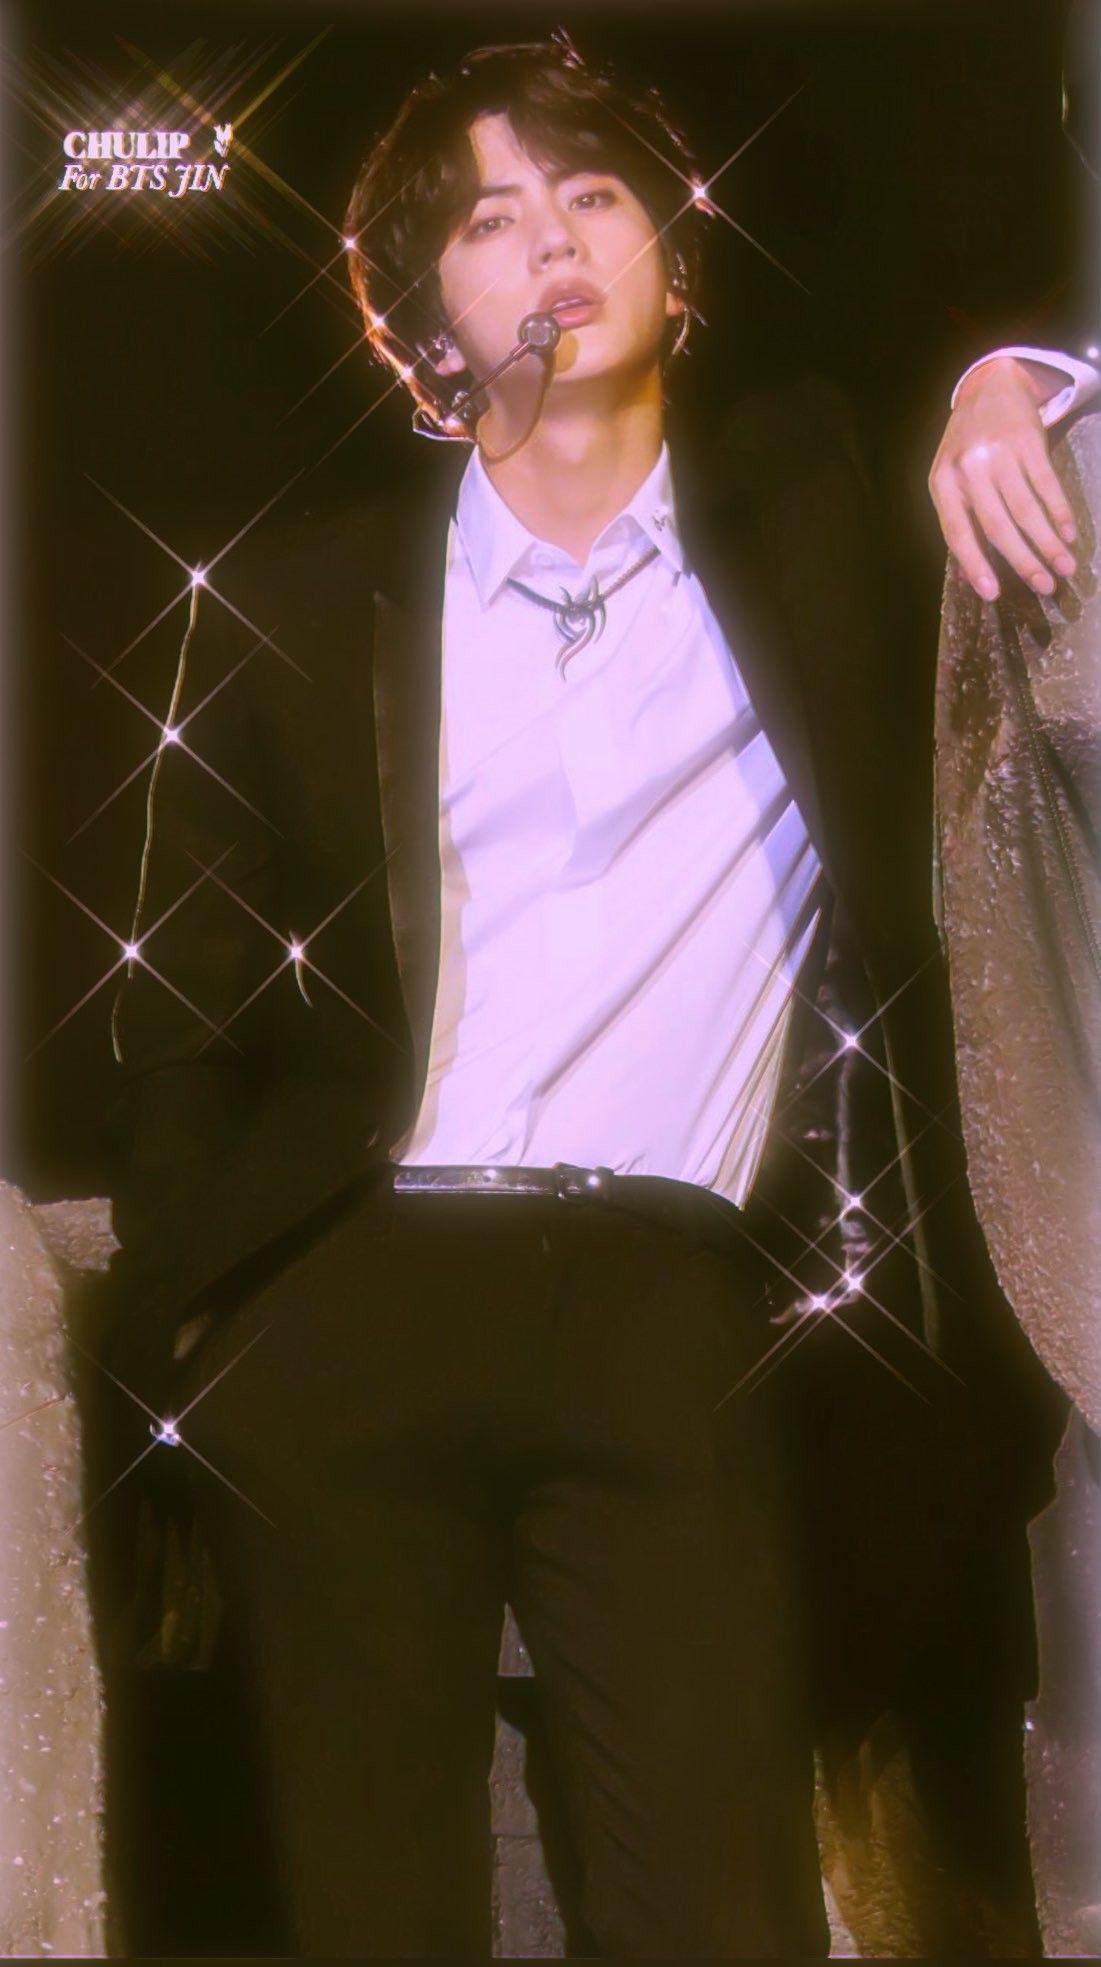 I Live For Jin S Long Black Hair Bts Jin Seokjin Bts Heartthrob